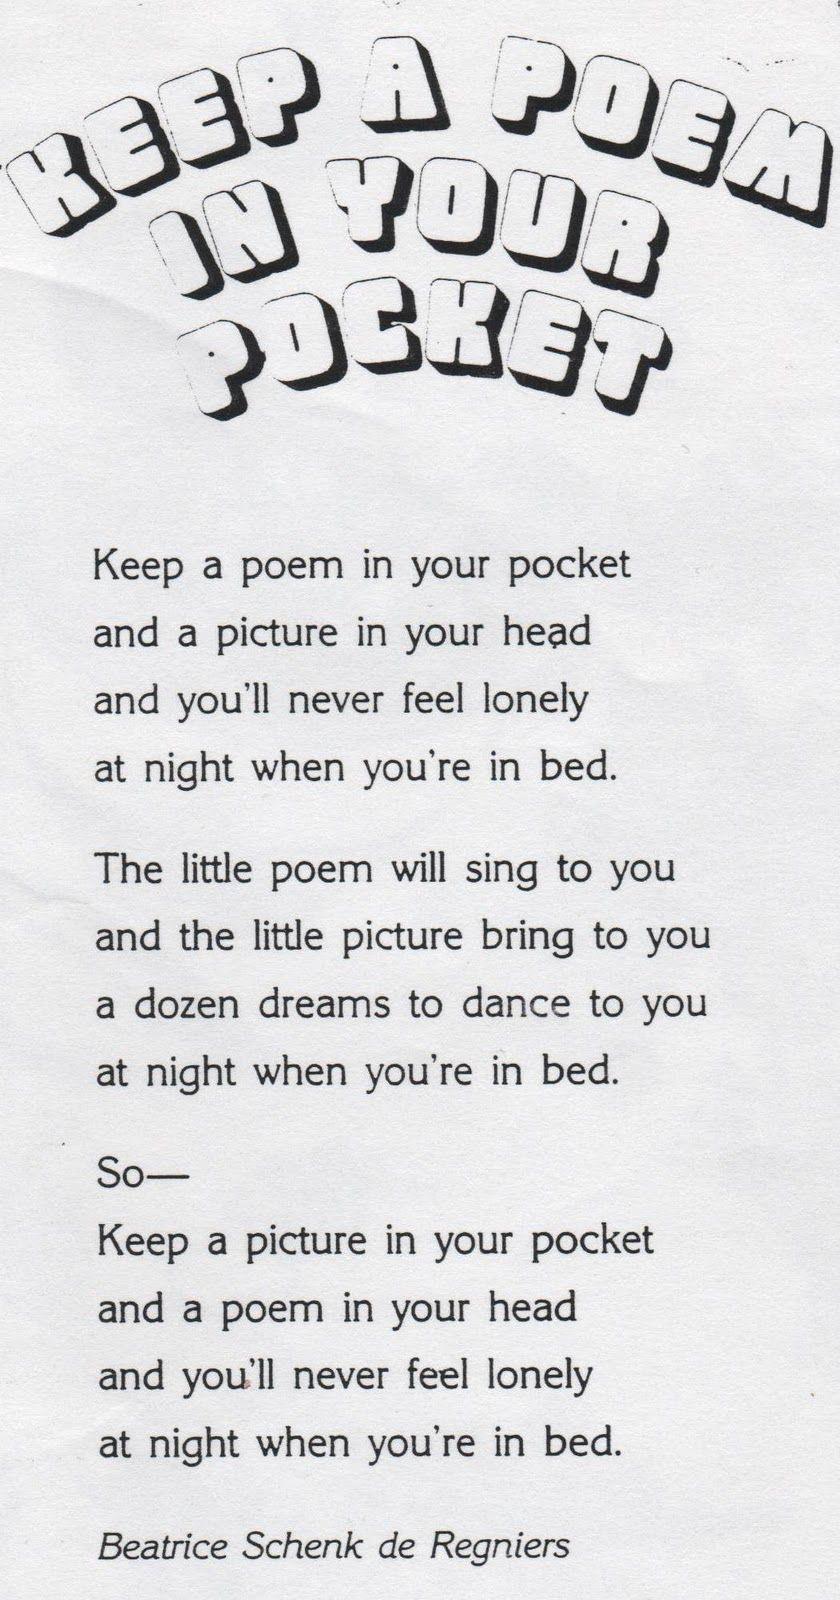 elementary school enrichment activities keep a poem in your pocket school stuff kids poems. Black Bedroom Furniture Sets. Home Design Ideas